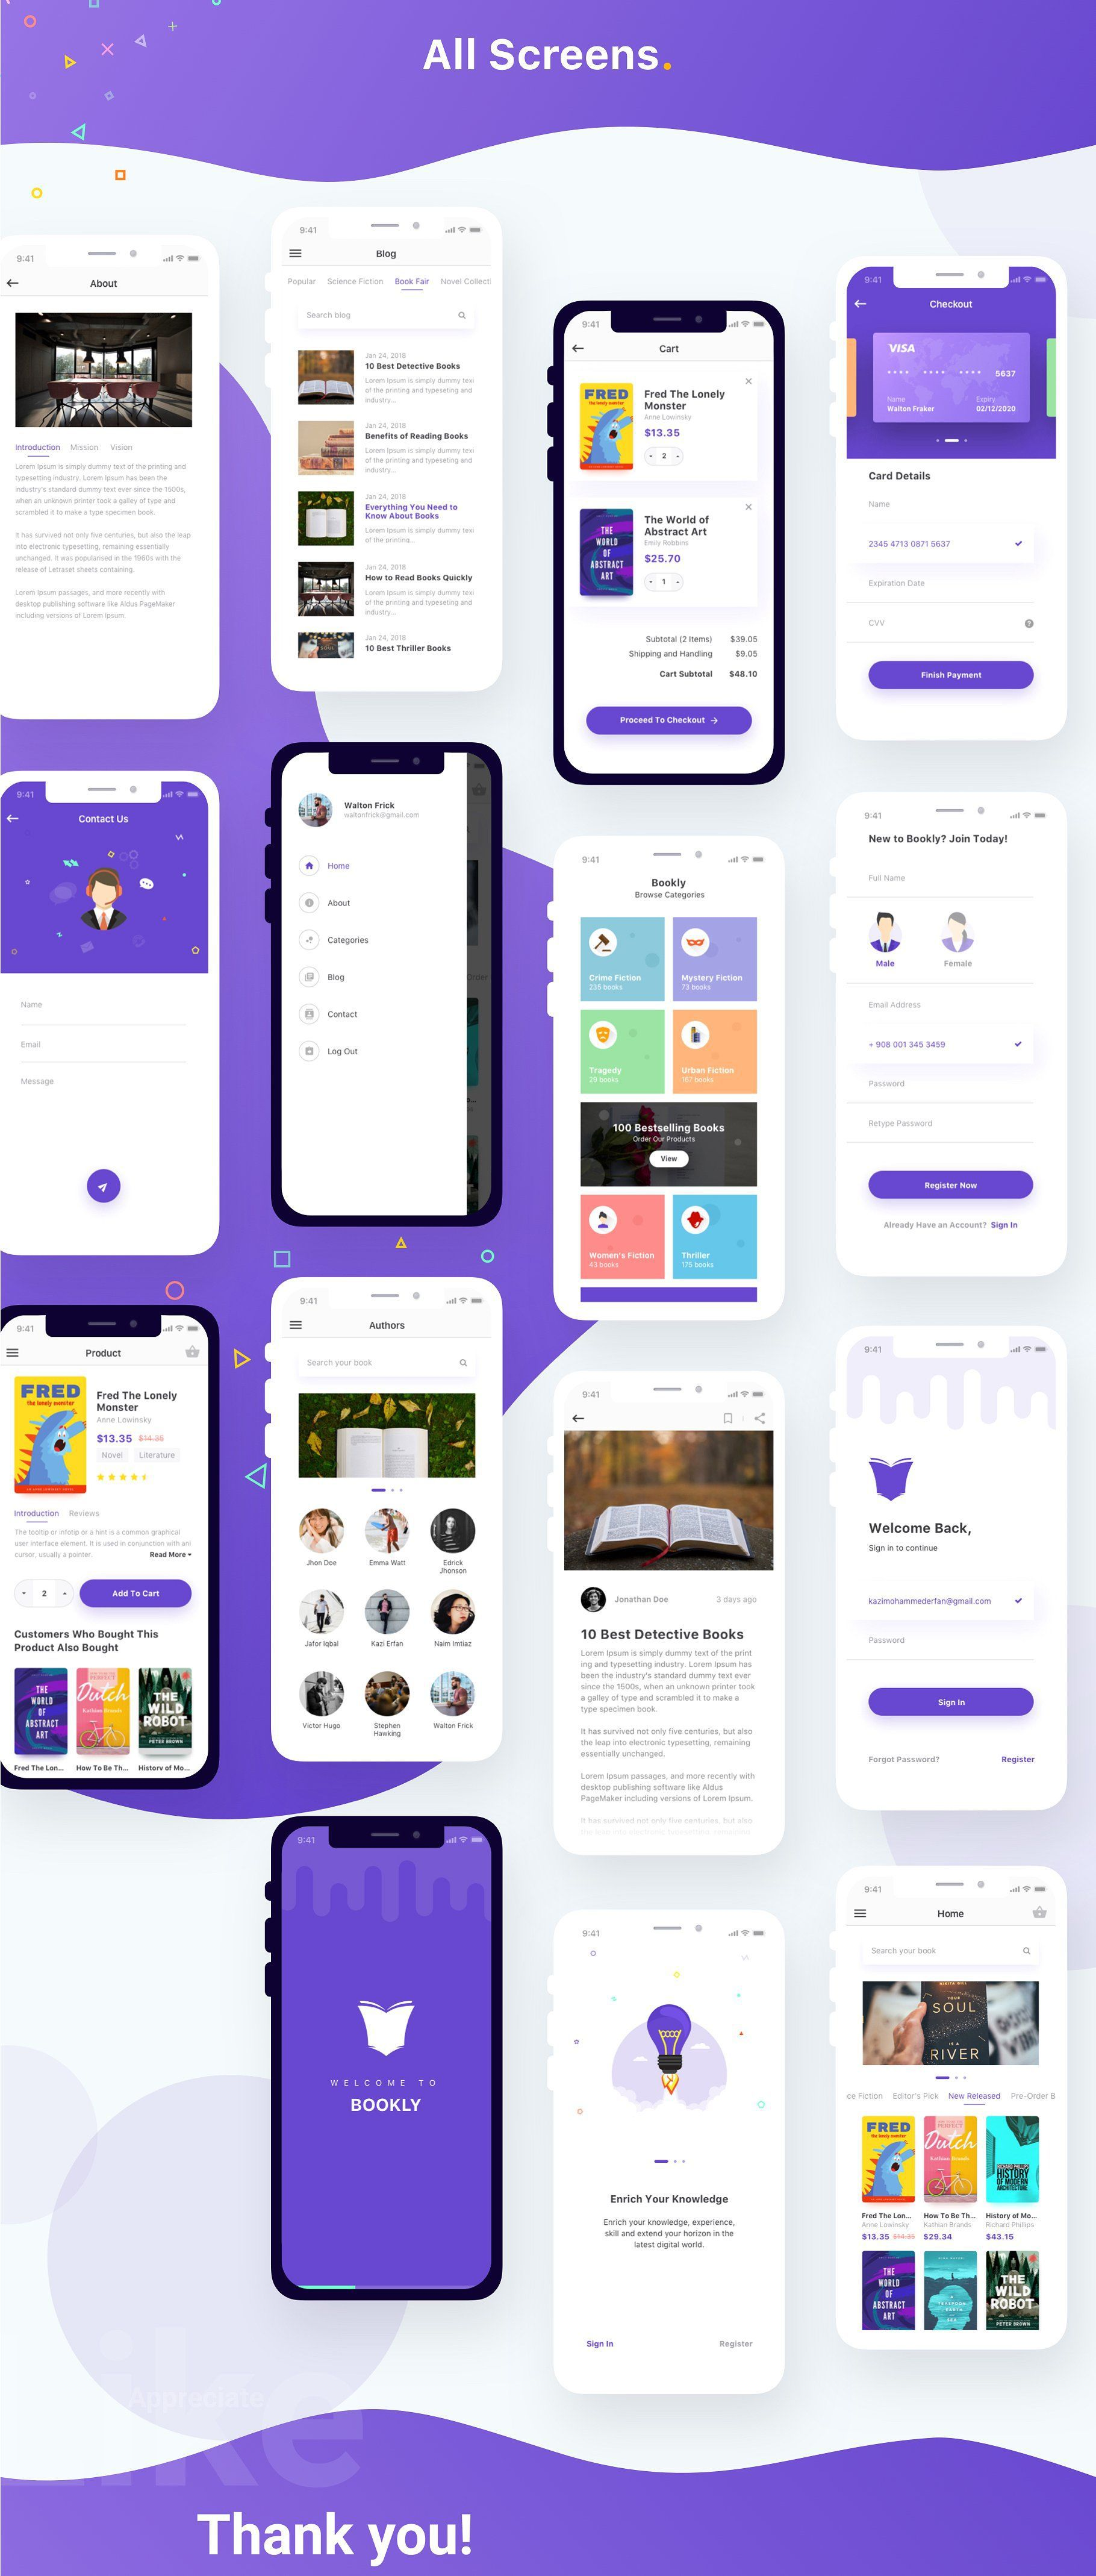 001 Fantastic Iphone App Design Template High Def  X Io SketchFull